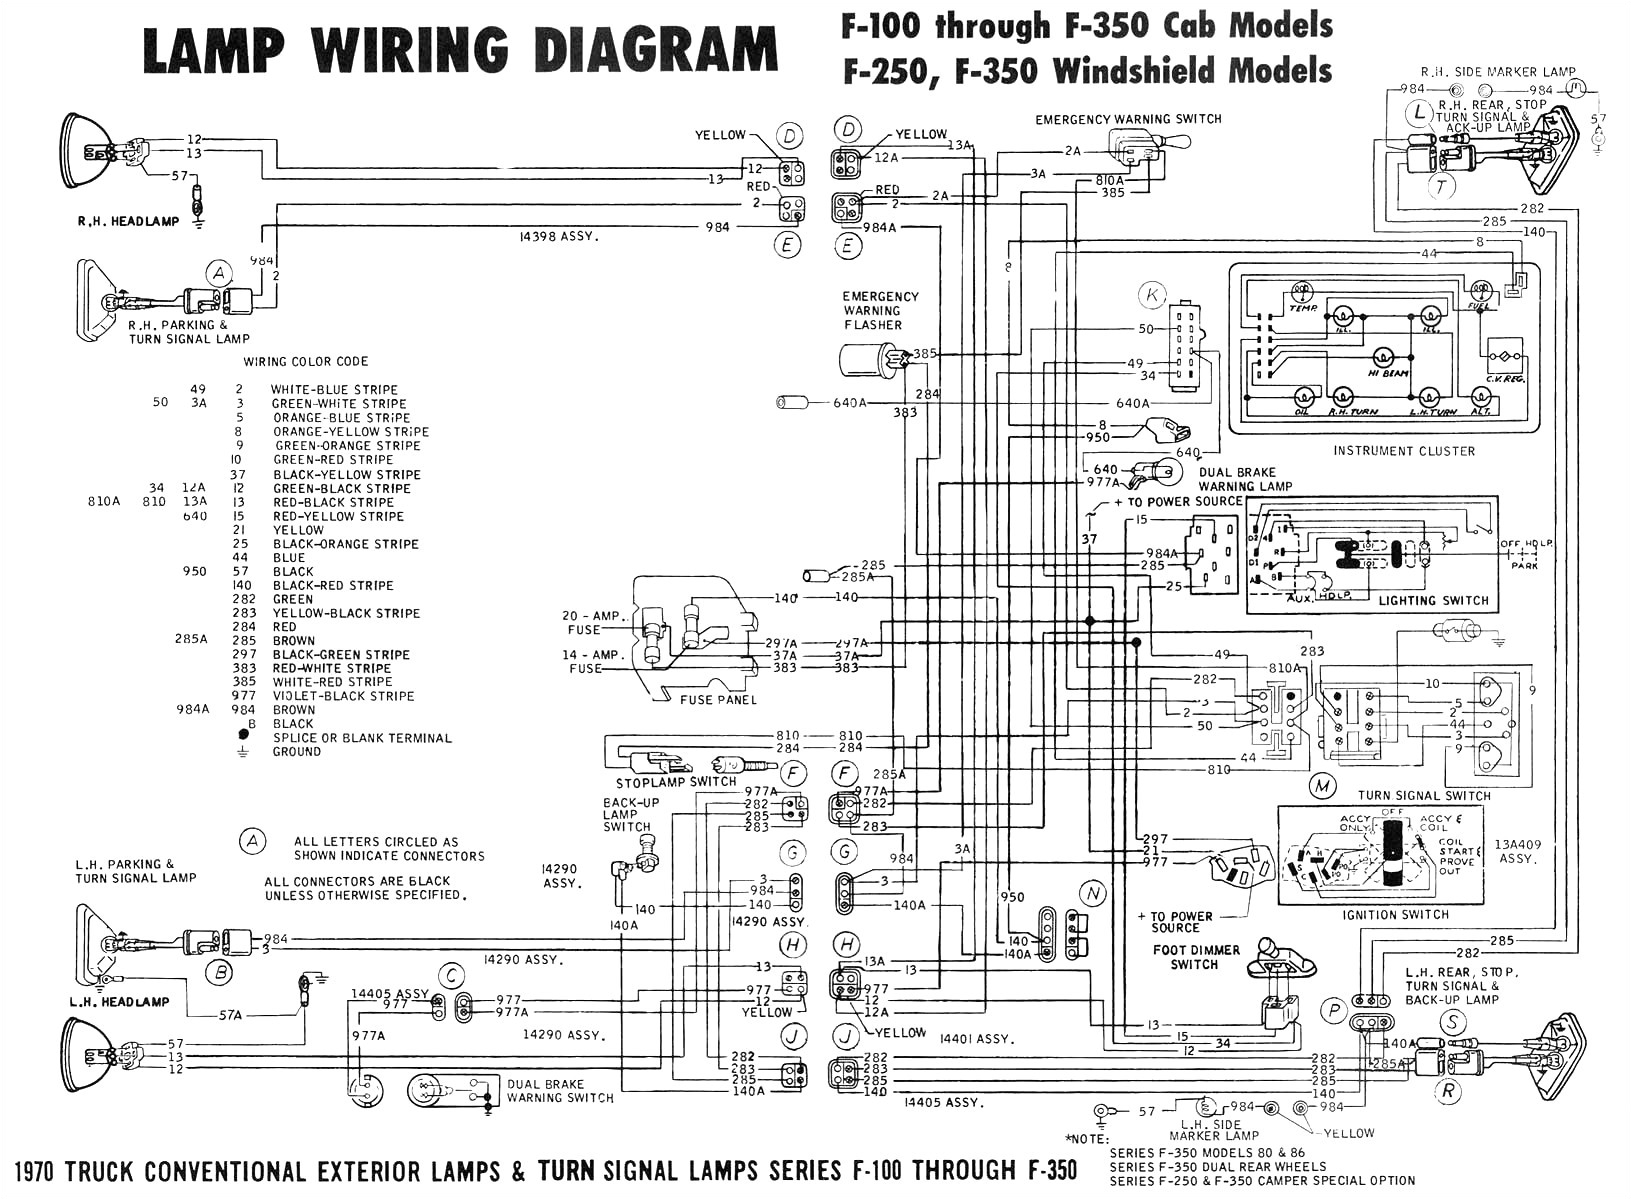 1995 f150 wiring diagram auto zone wiring diagram new 1995 f150 wiring diagram auto zone